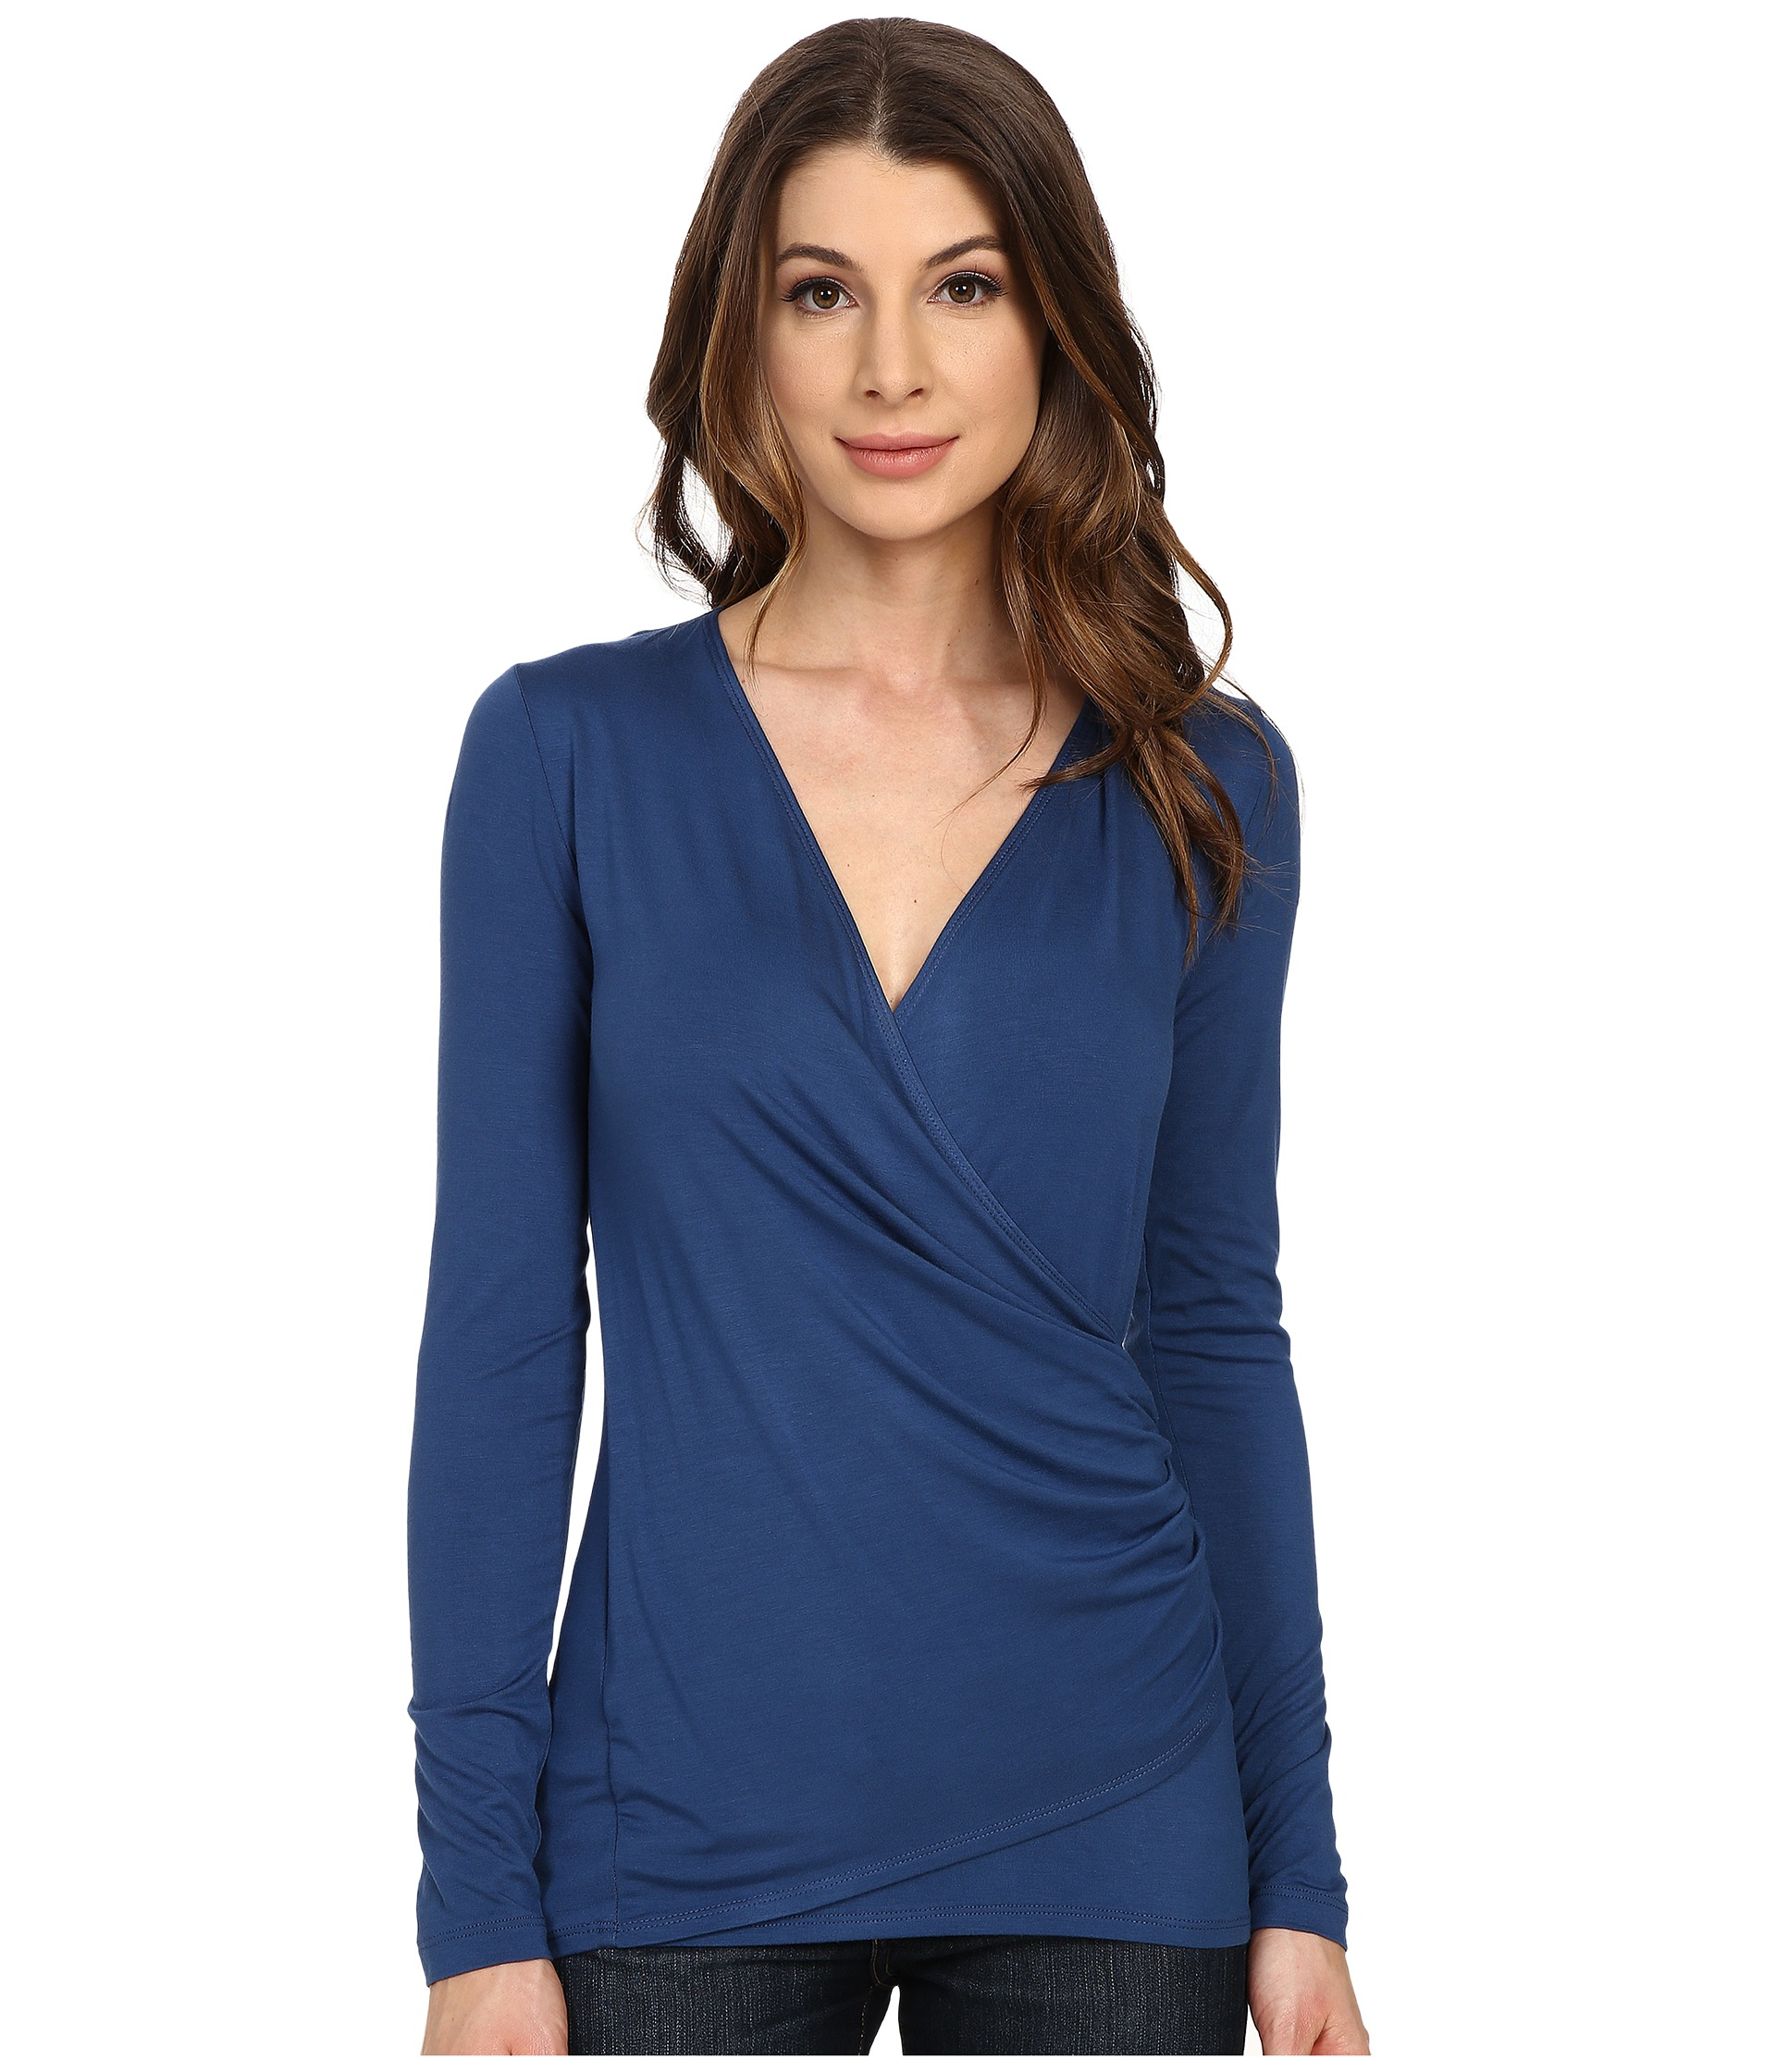 e5e11c83c23c Karen Kane Long Sleeve Faux Wrap Top in Blue - Lyst